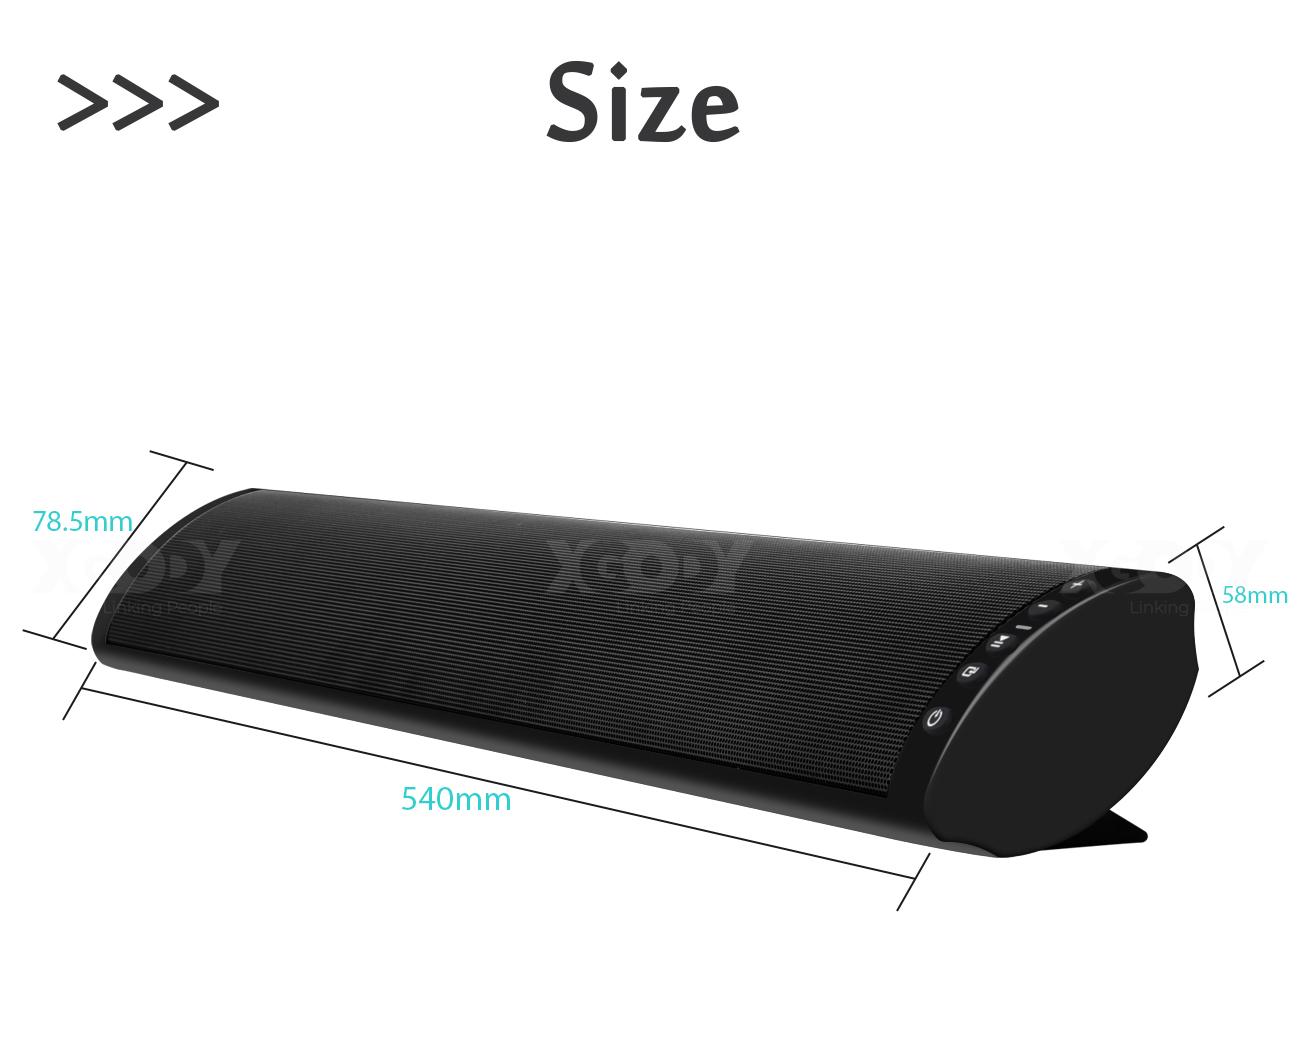 BS-41 Soundbar Bluetooth 5.0 Wireless with Subwoofer